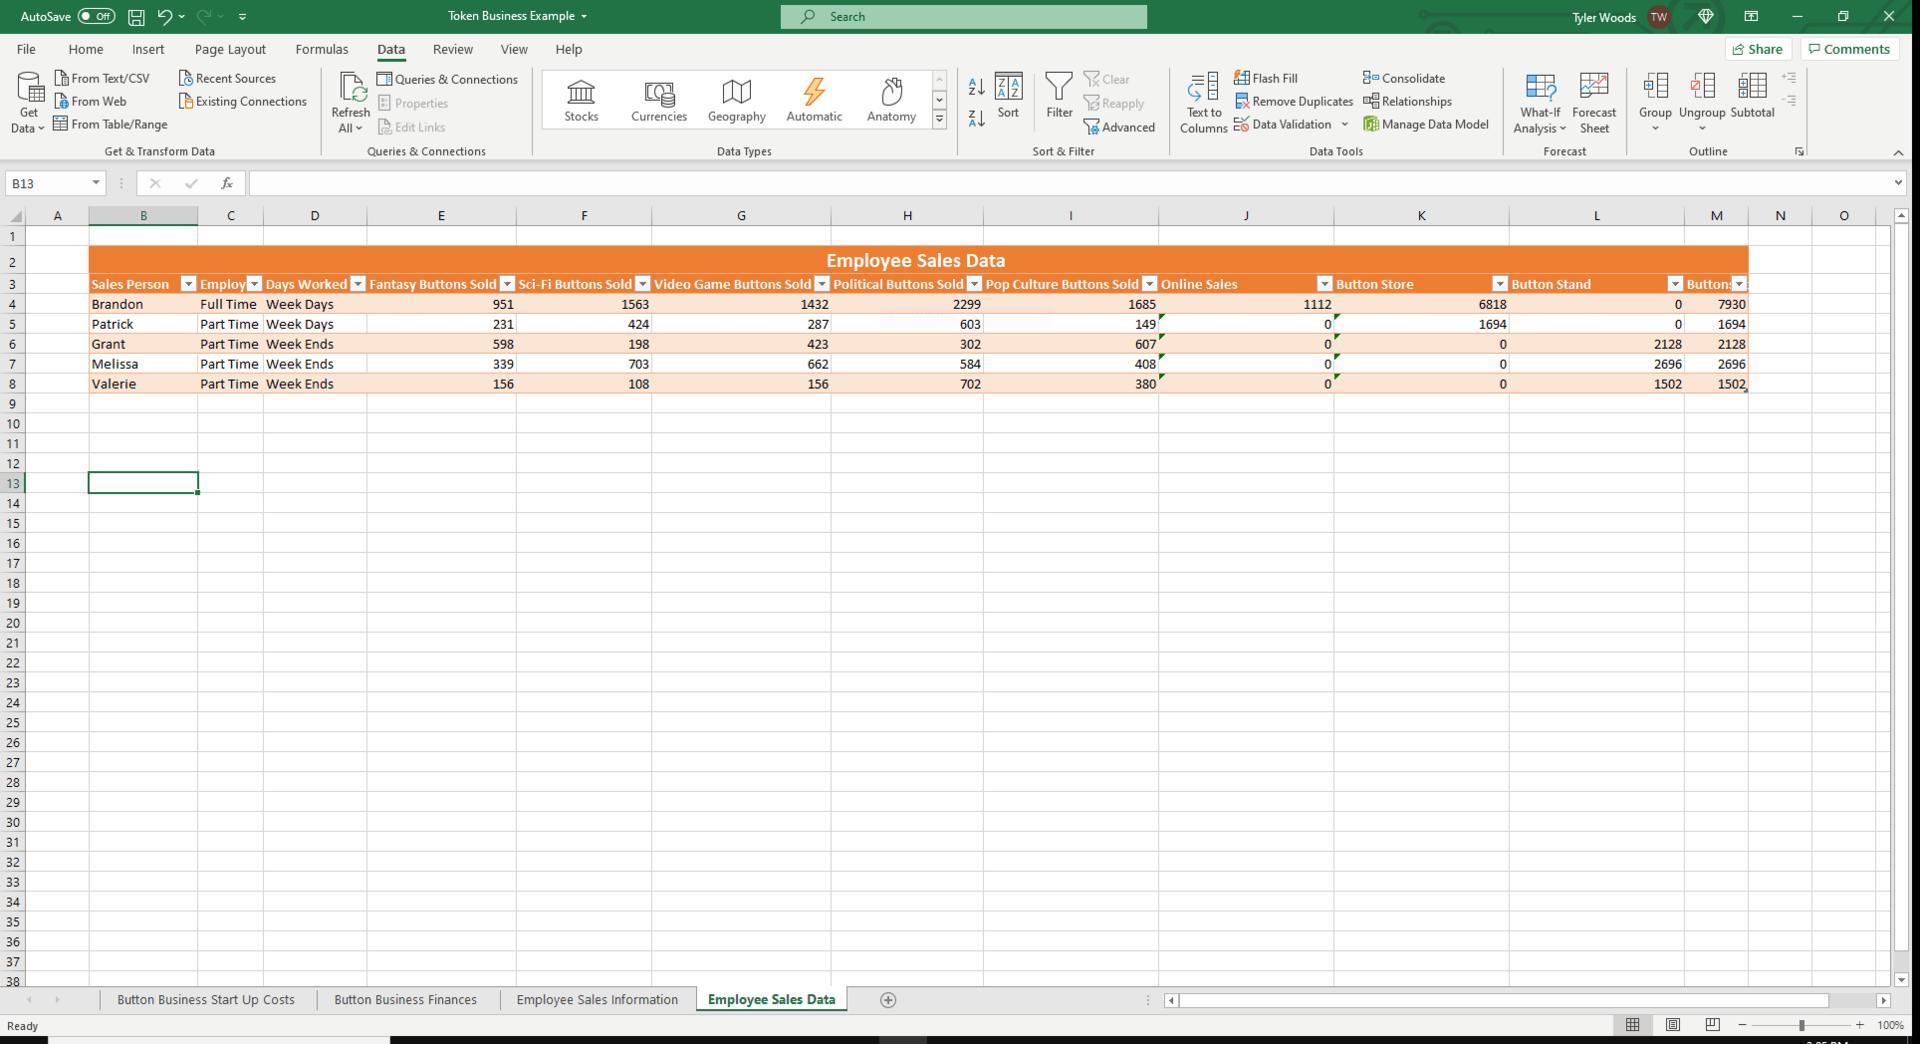 Employee Sales Data